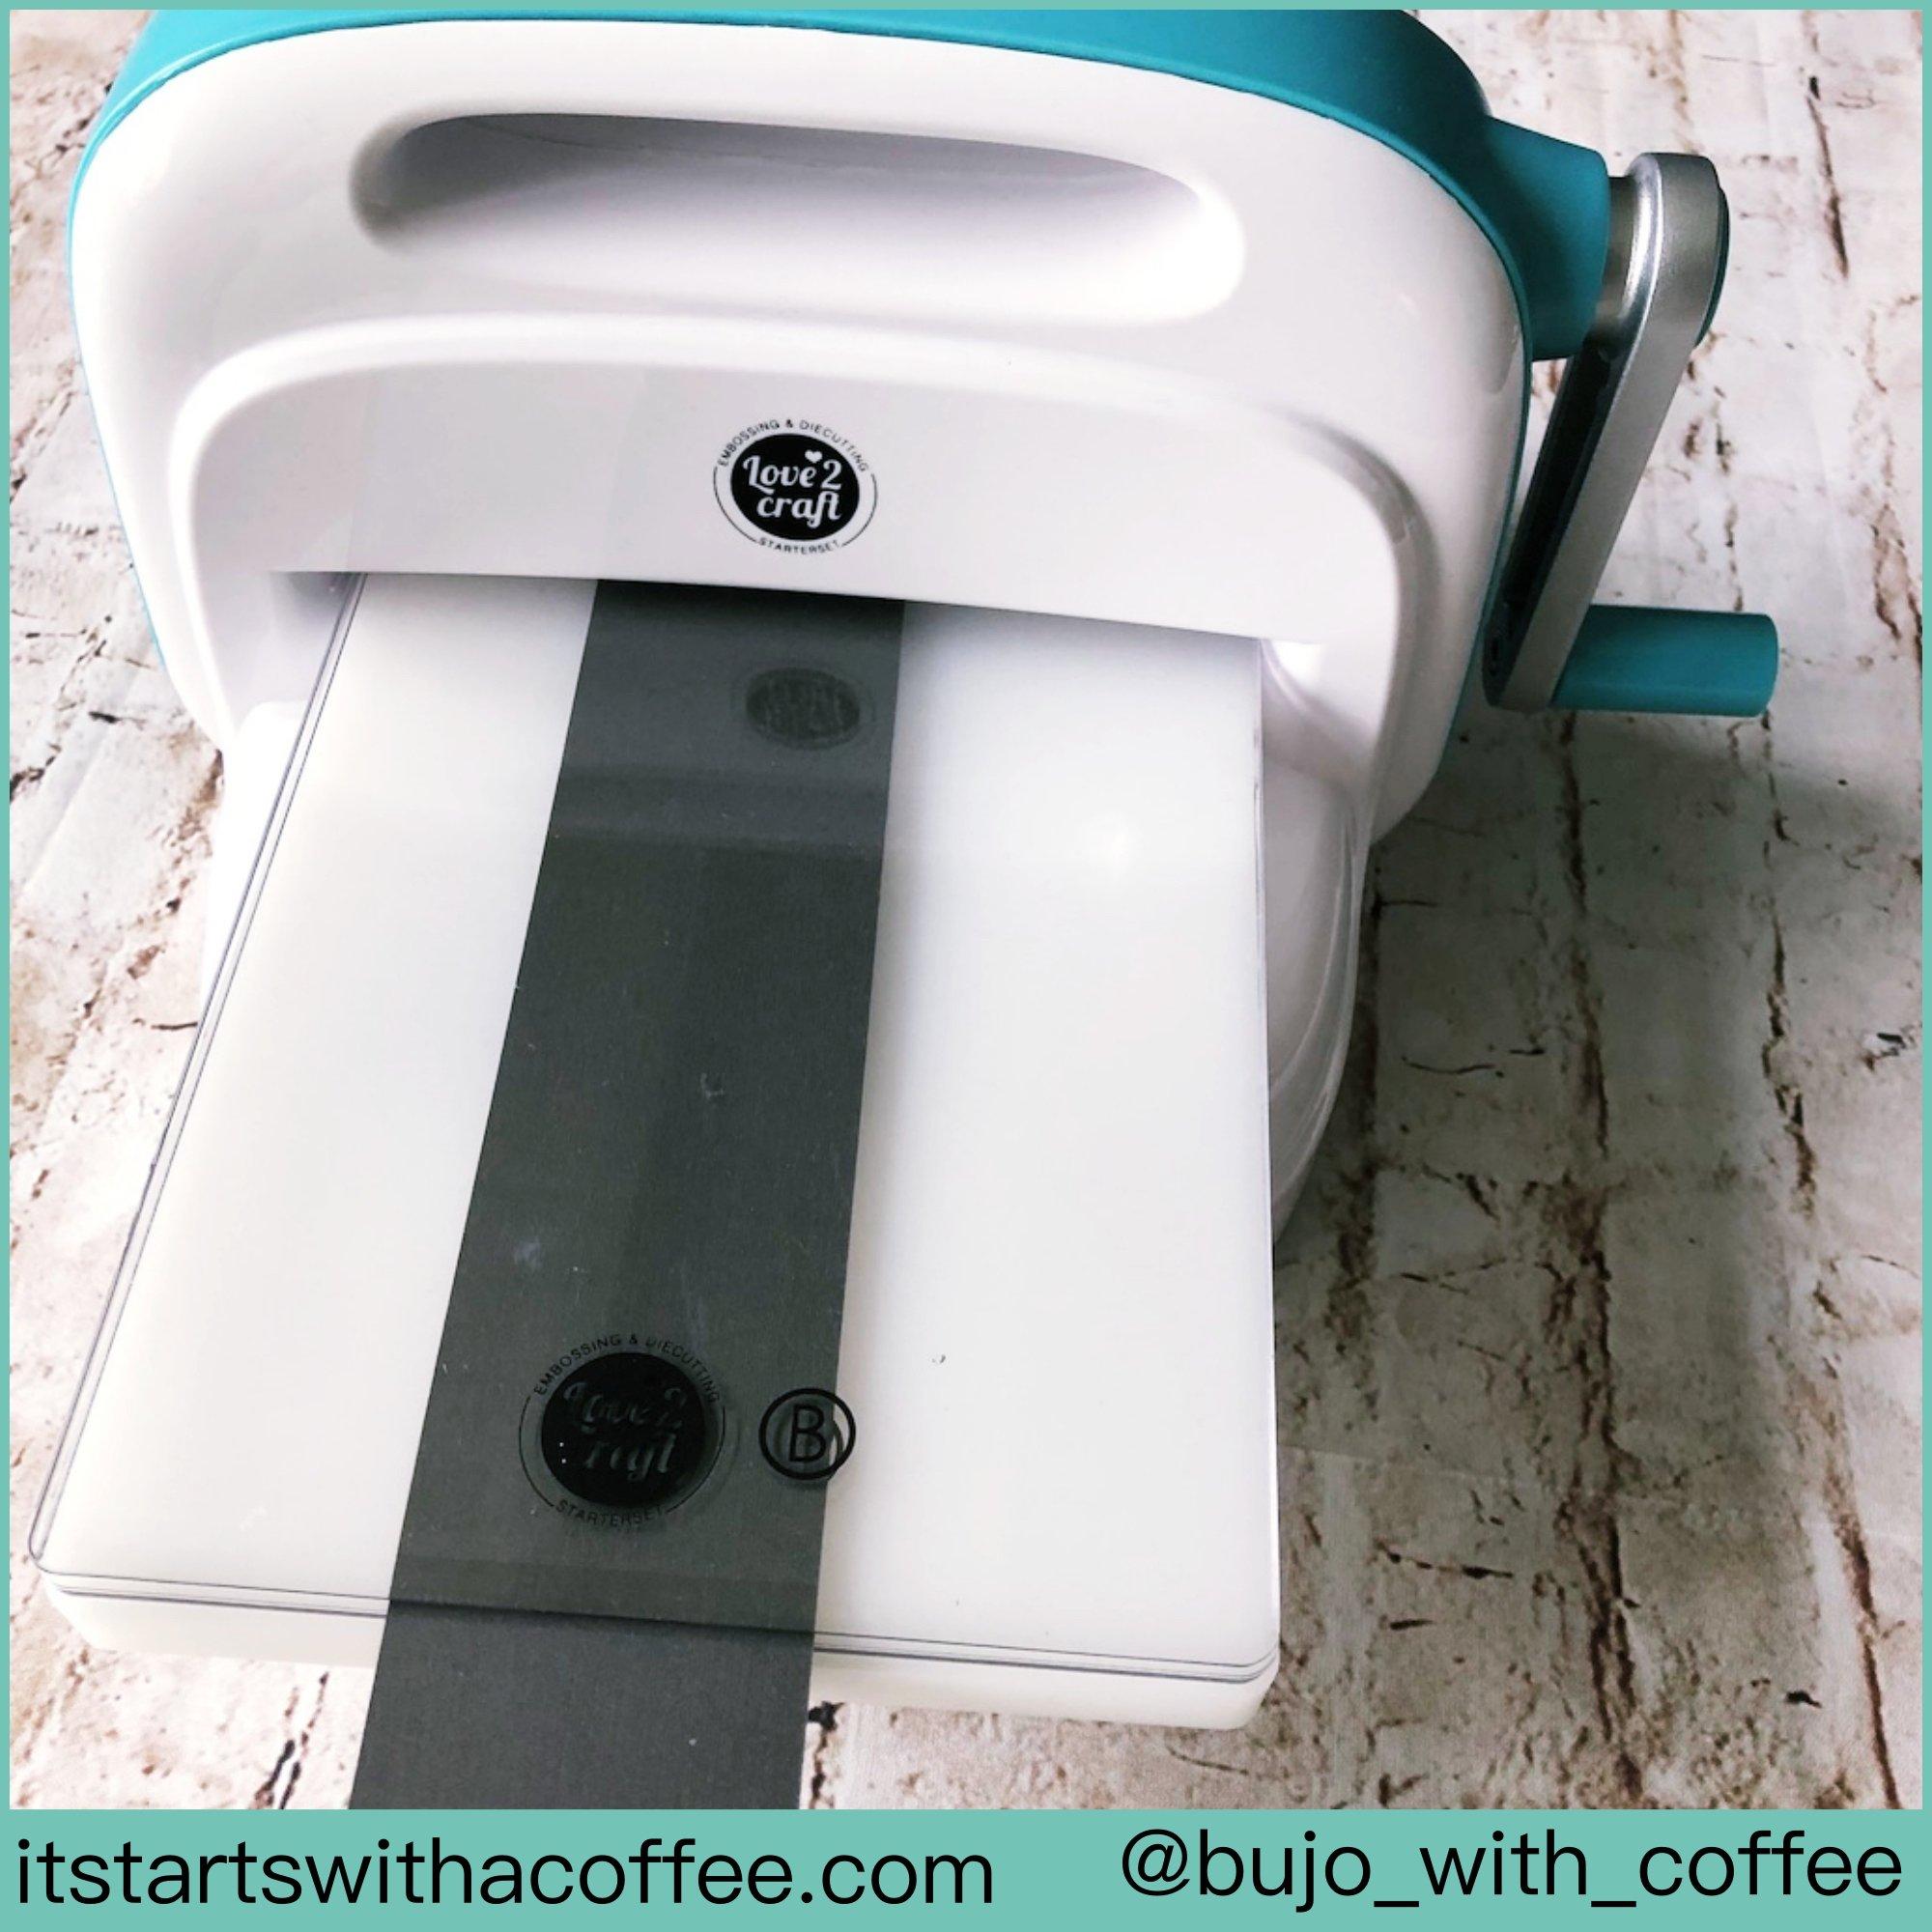 Embossing Die Cutting Machine - itstartswithacoffee.com #embossing #diecutting